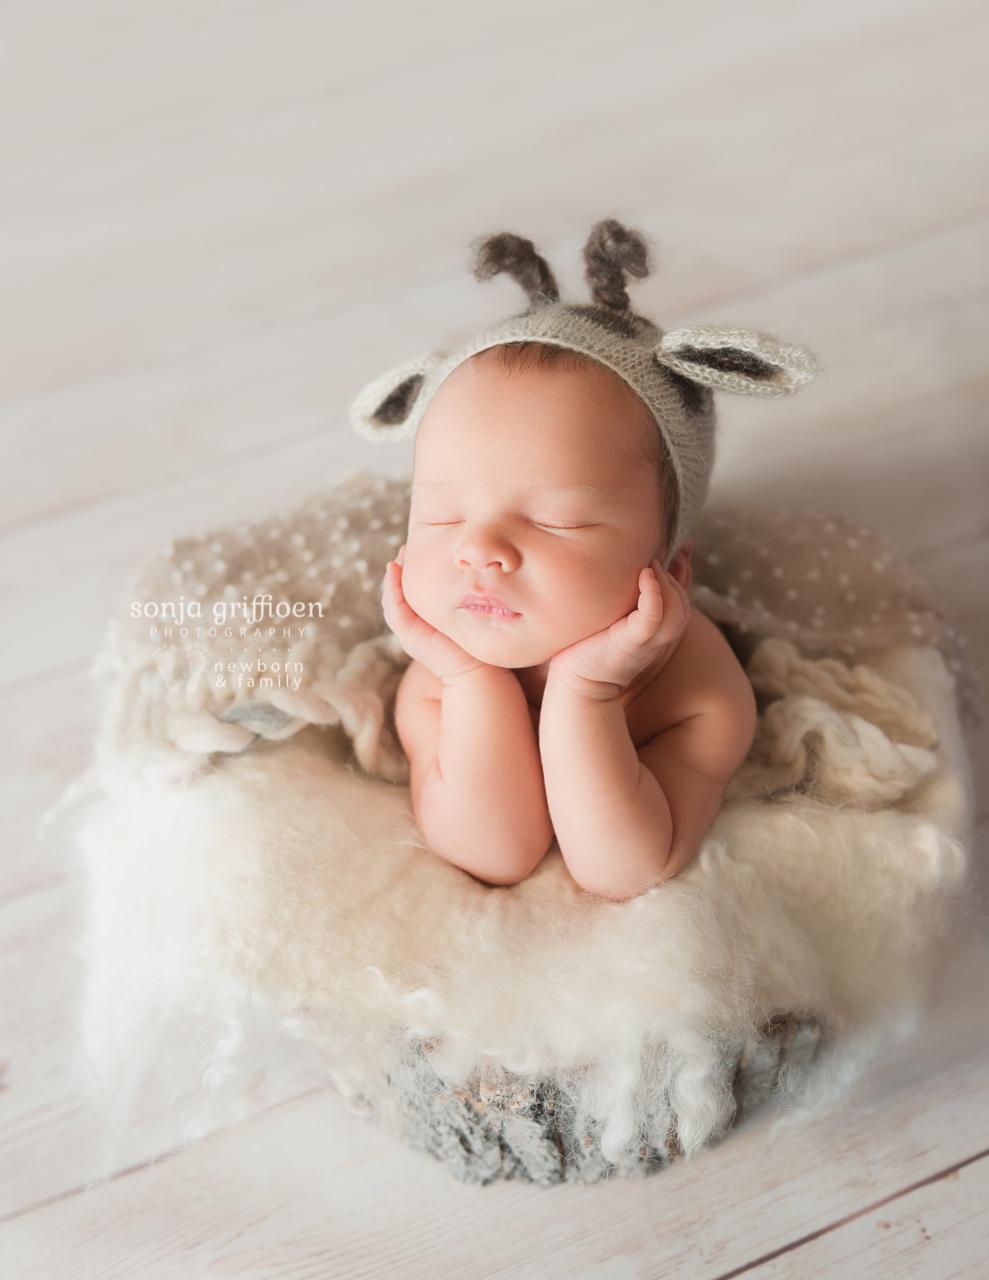 Lukas-Newborn-Brisbane-Newborn-Photographer-Sonja-Griffioen-061.jpg